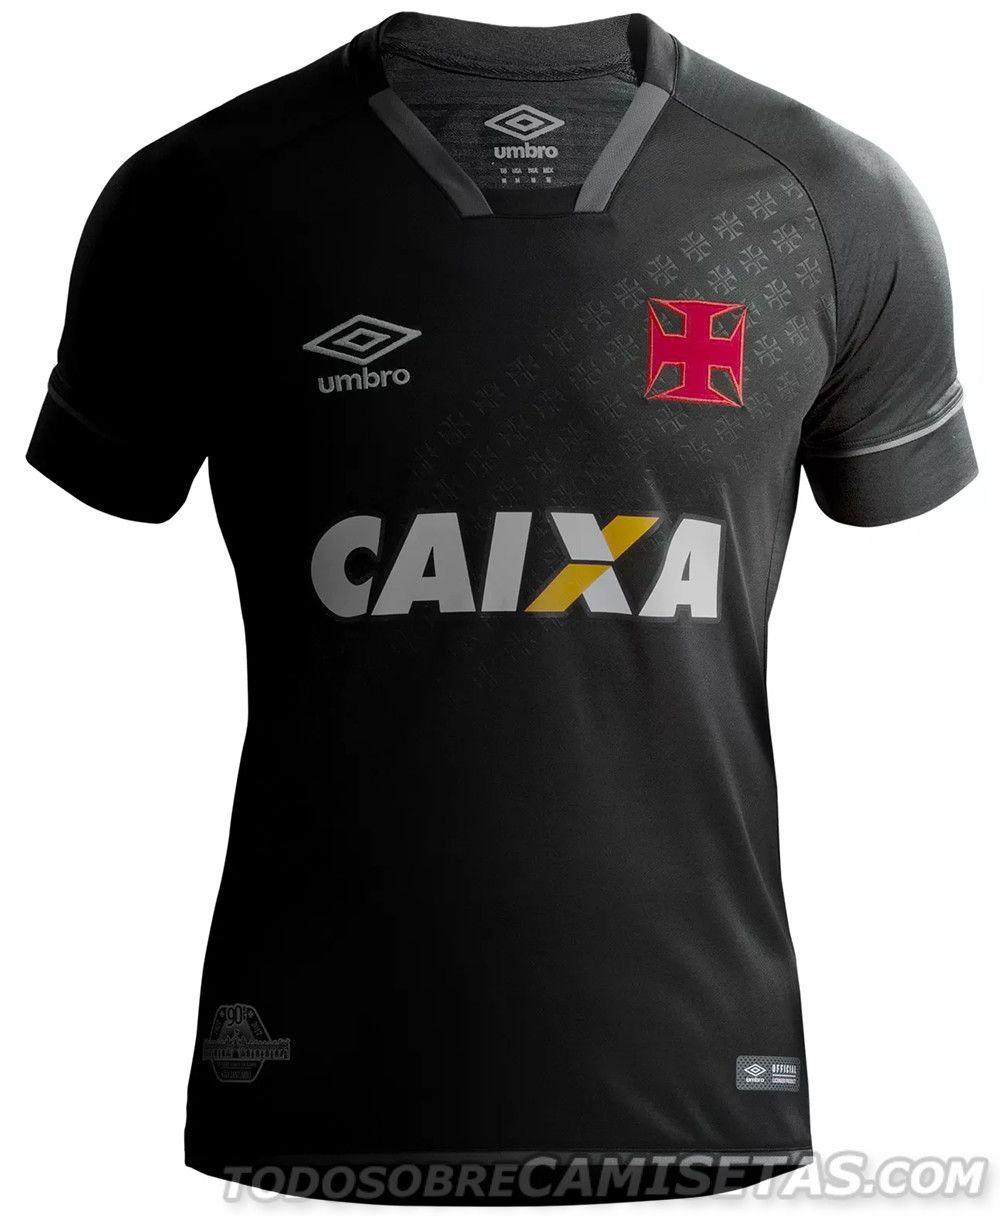 Tercera camiseta Umbro de Vasco da Gama 2017-18  fdf53873747d3